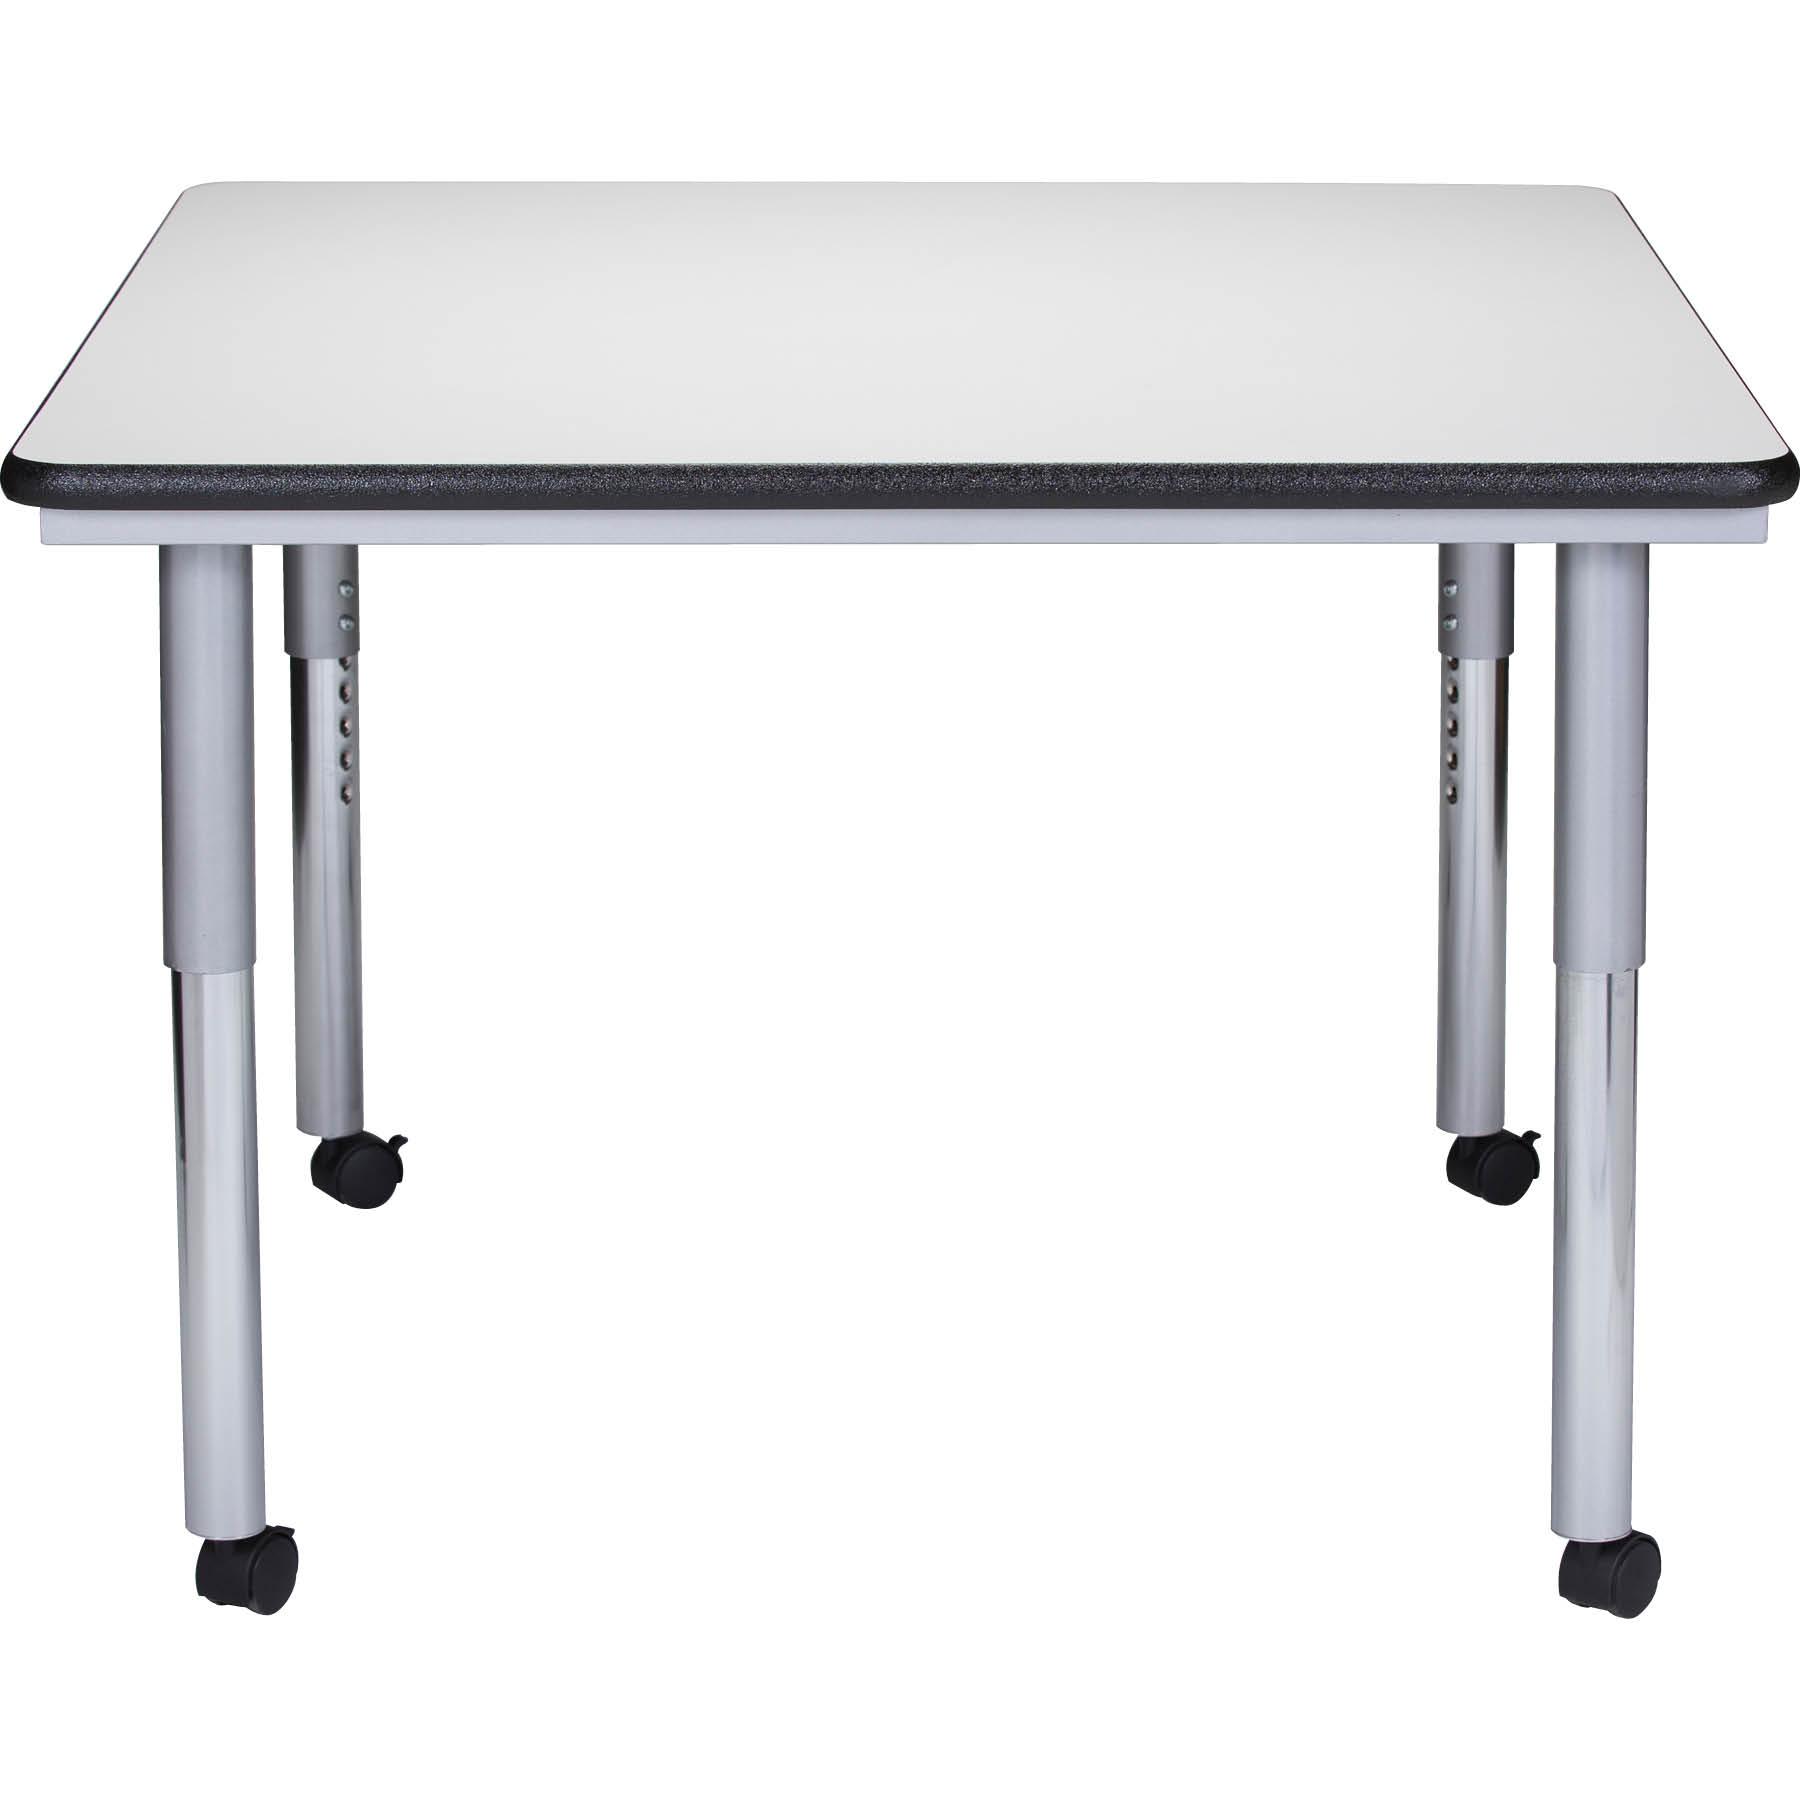 30x60 Galaxy Planner Table